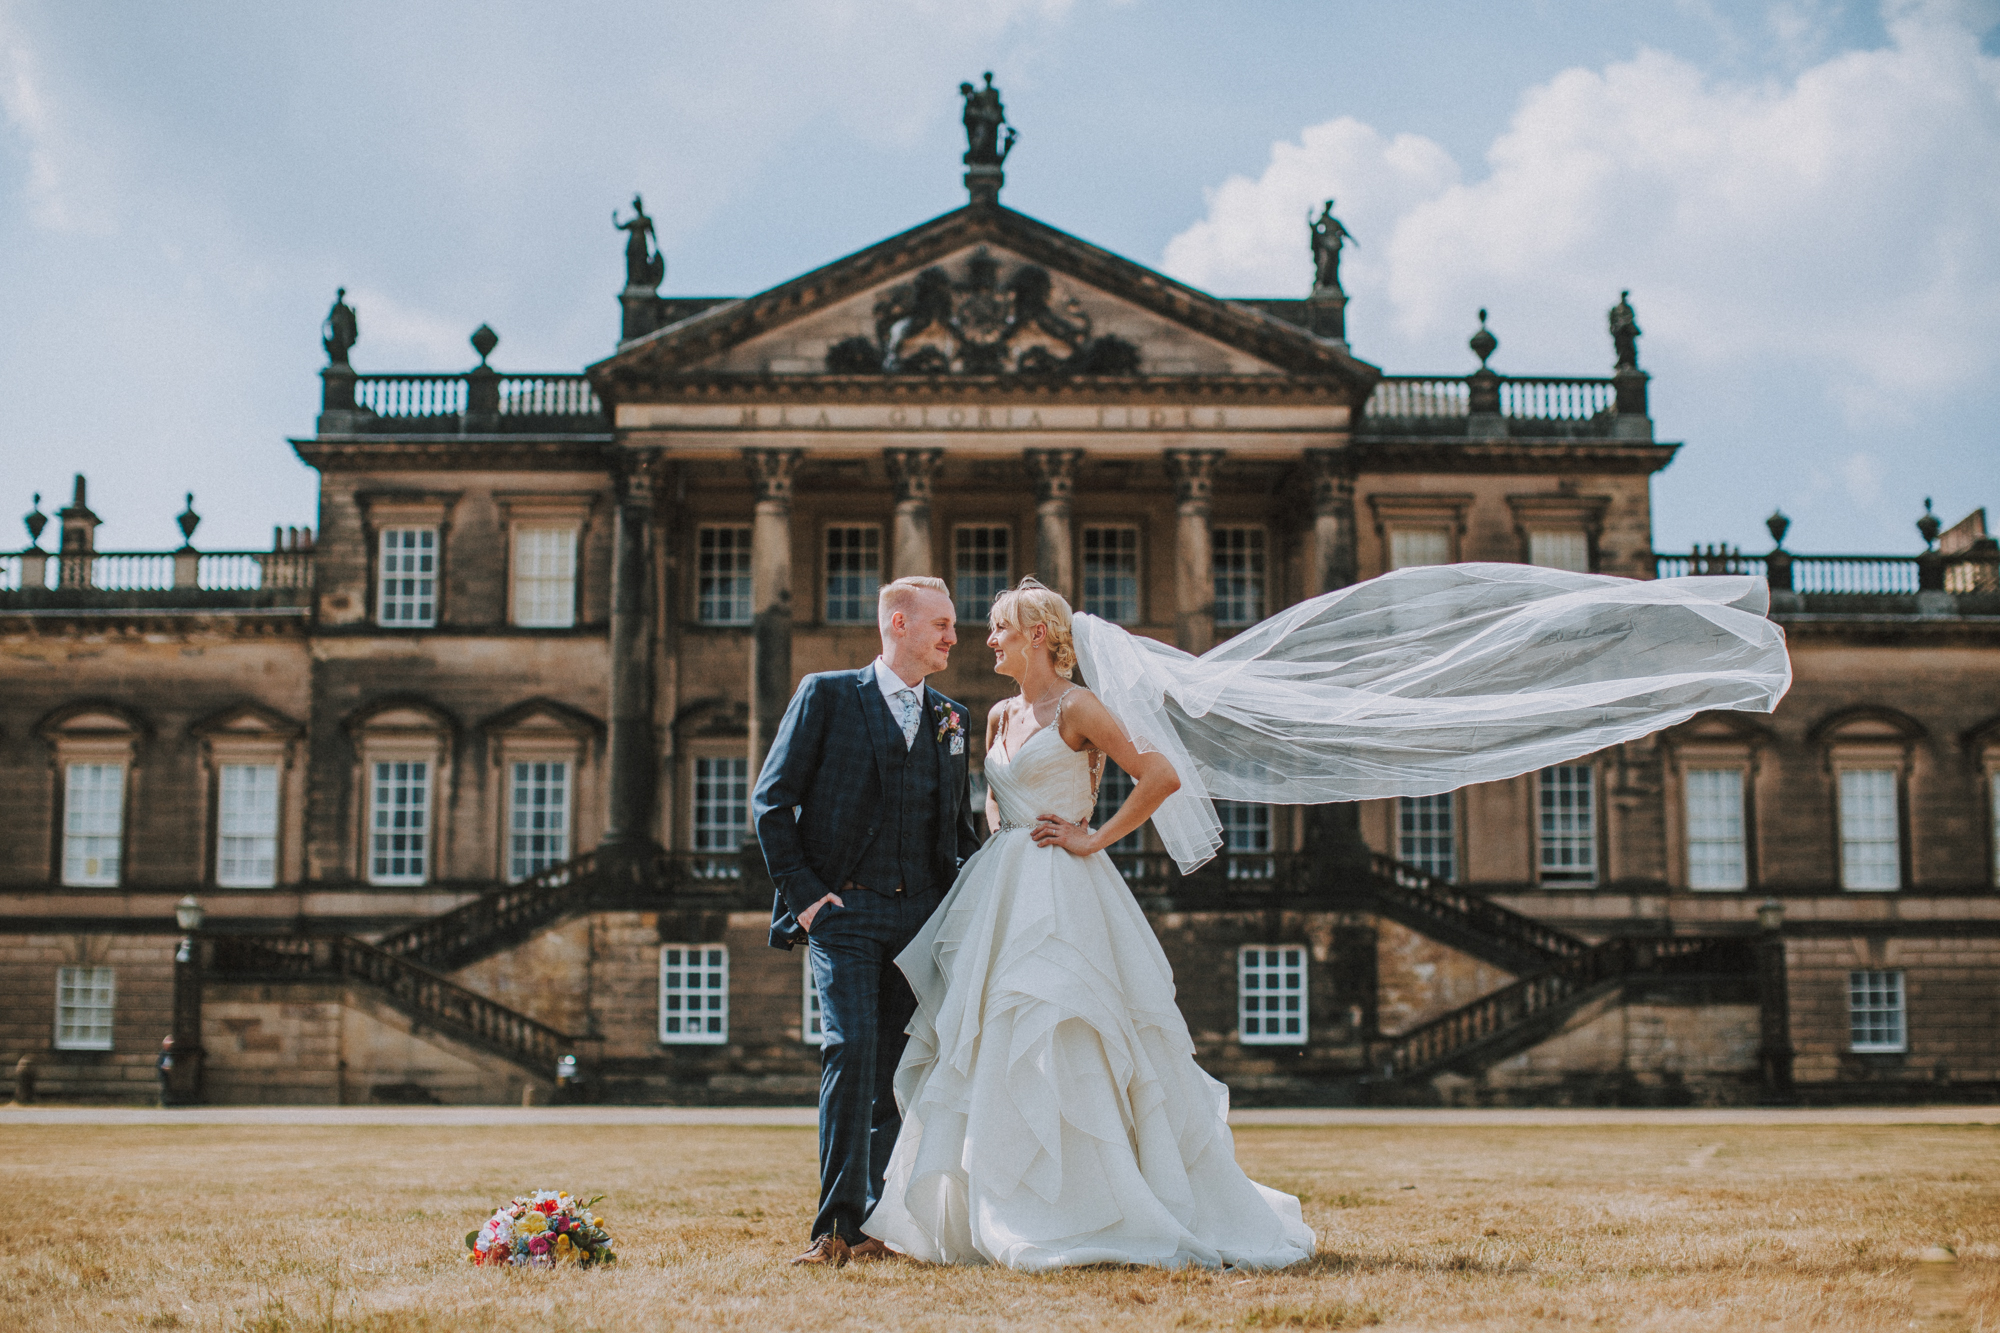 wentworth woodhouse weddings photographer-40.jpg